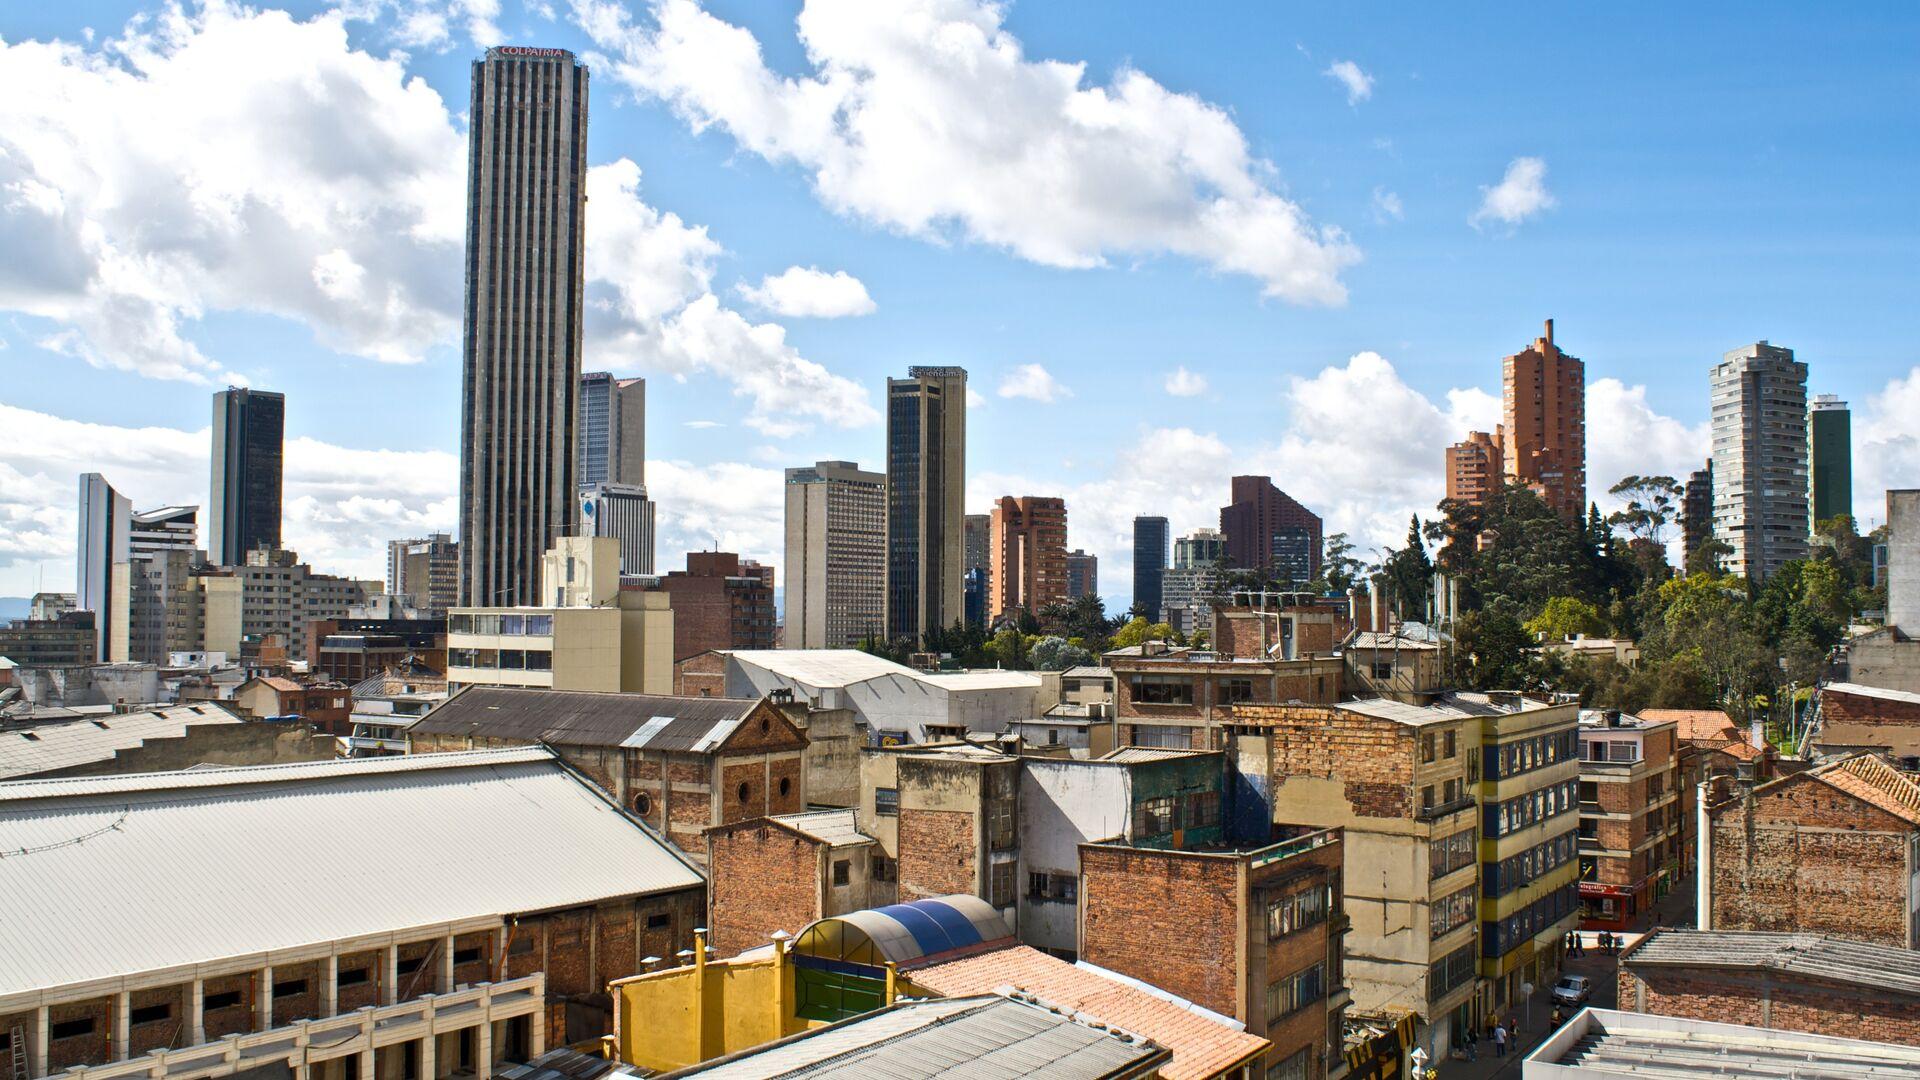 Bogotá, la capital de Colombia - Sputnik Mundo, 1920, 25.07.2021